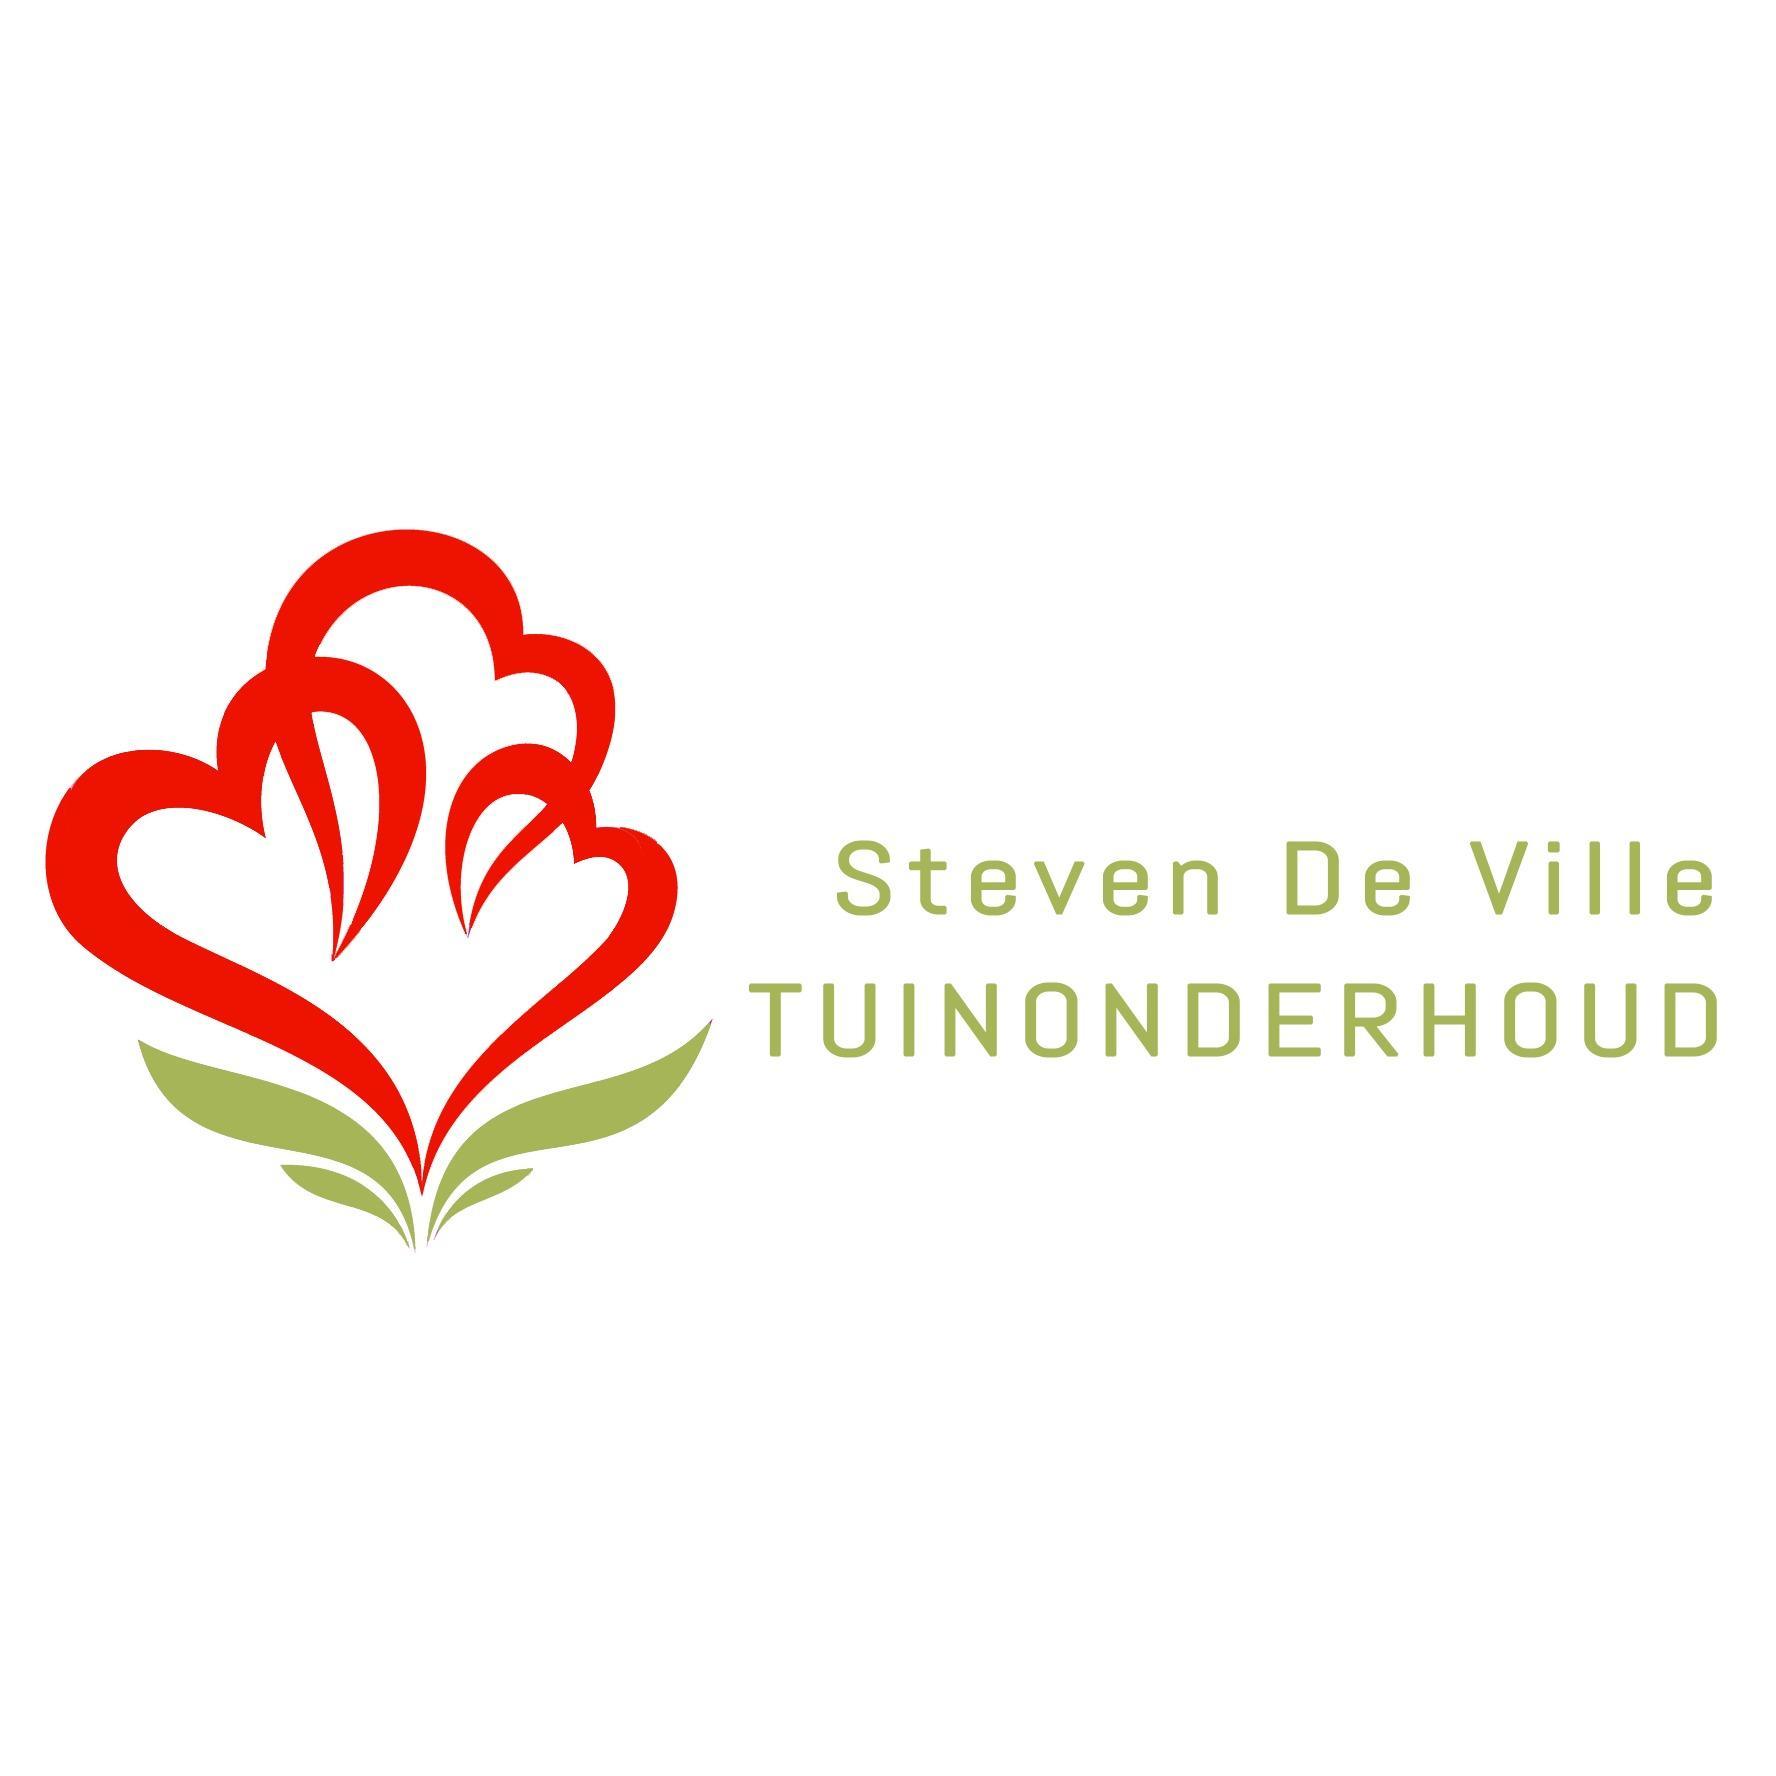 Steven De Ville Tuinonderhoud